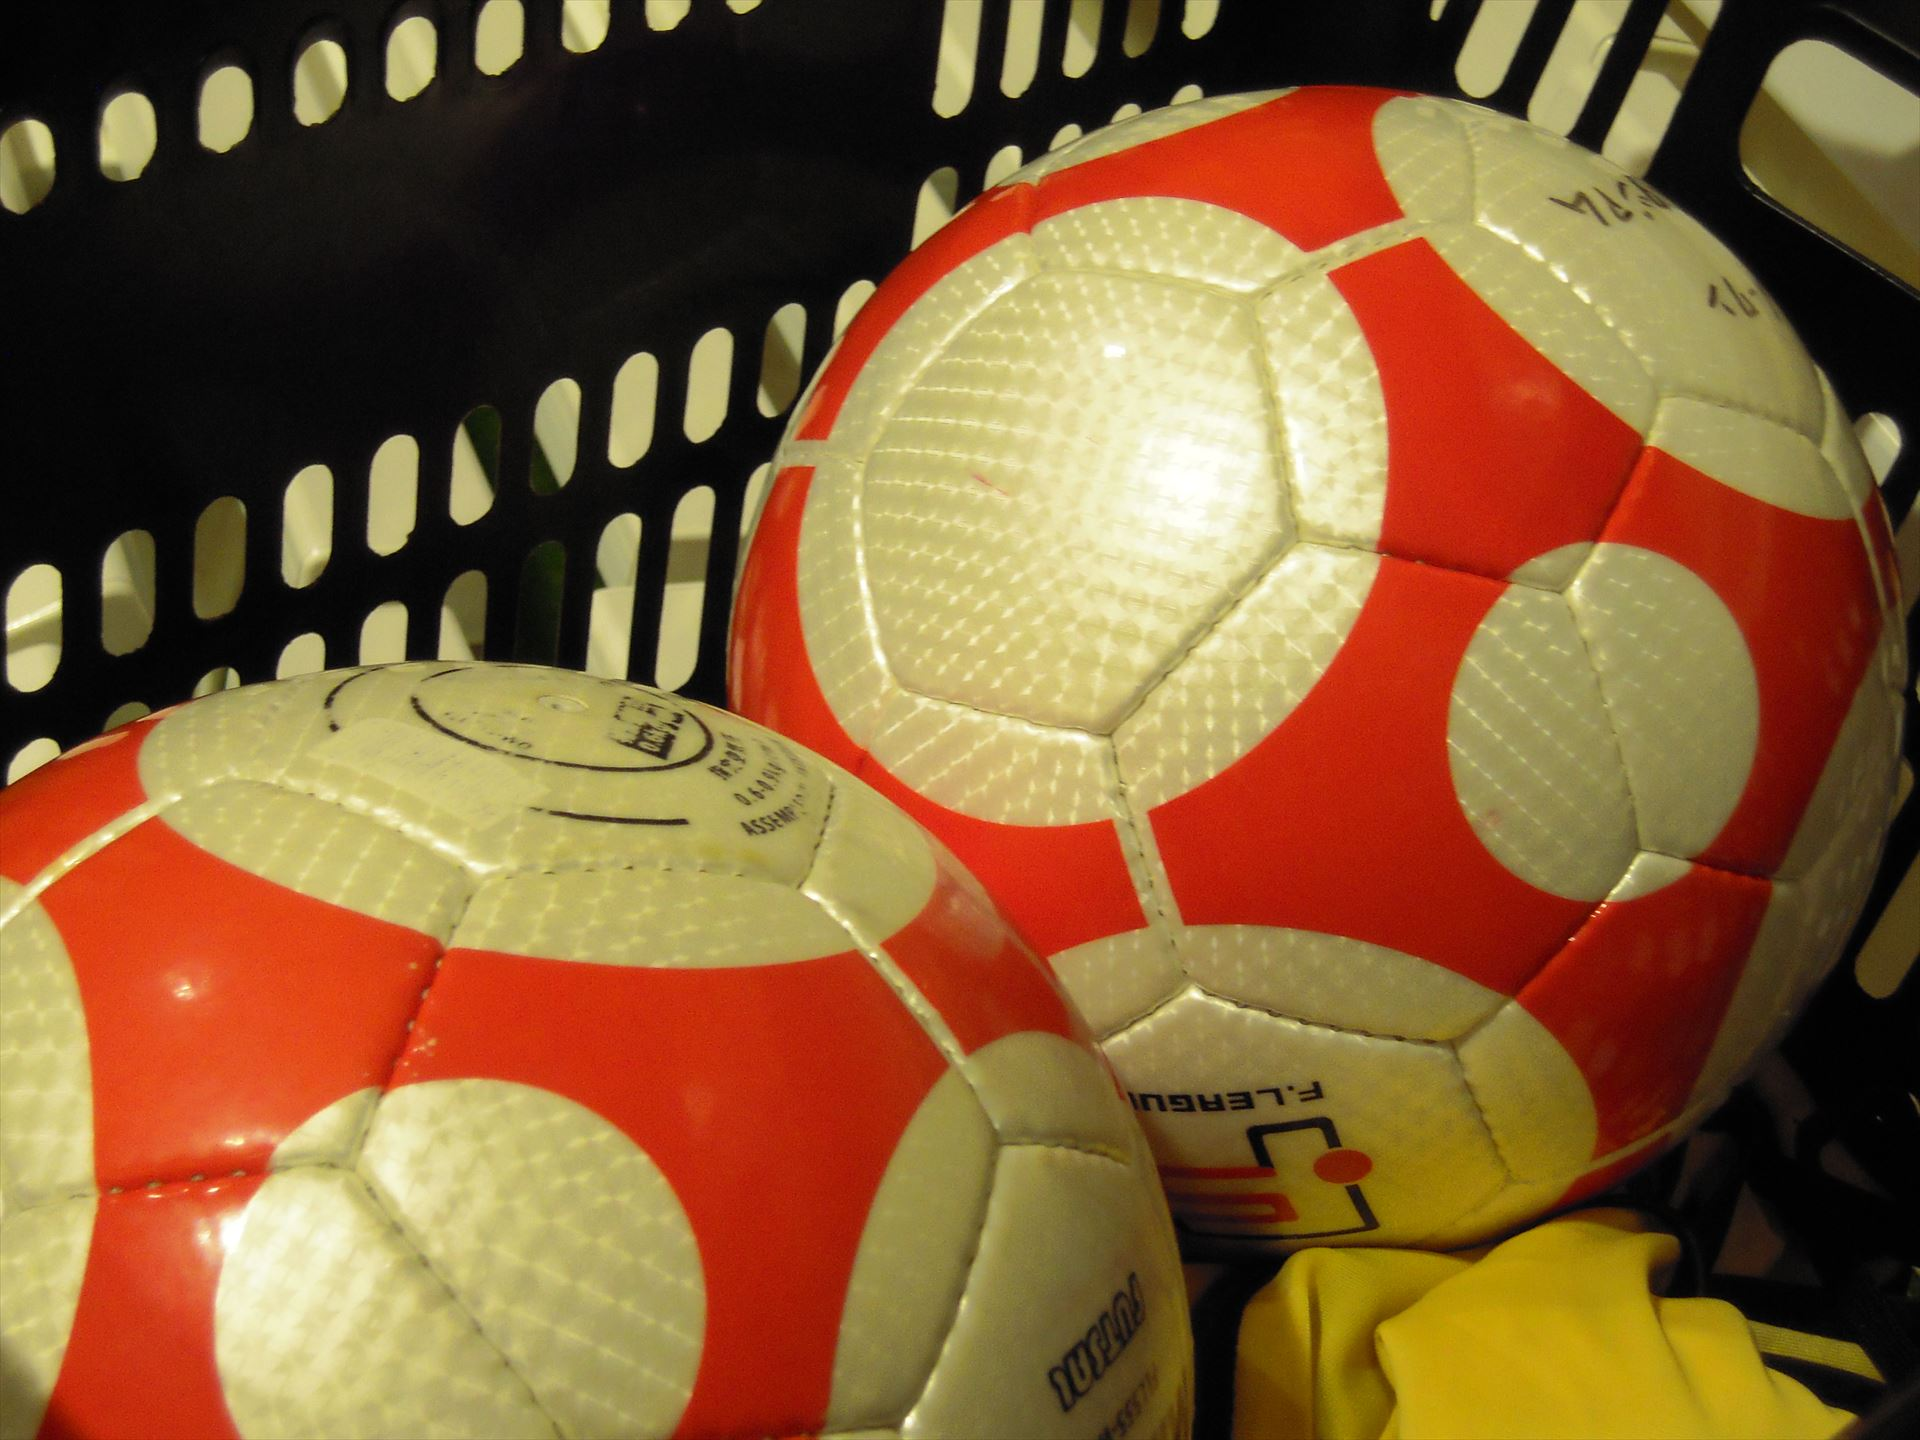 futsal-ball-201504.jpg